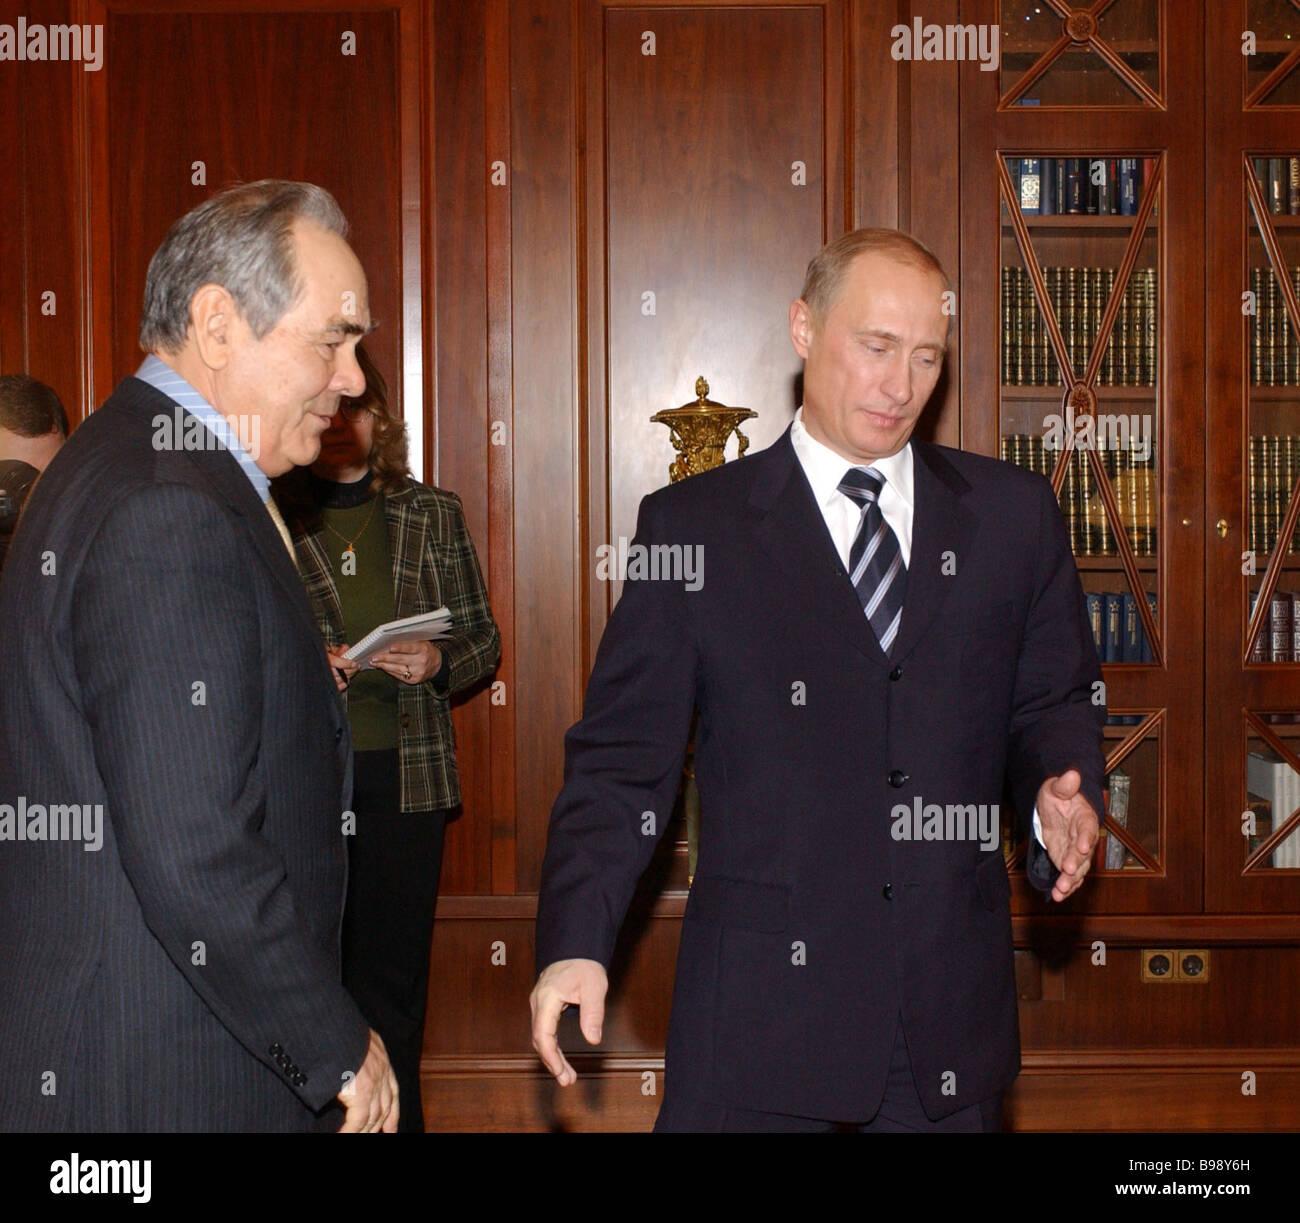 President Vladimir Putin of the Russian Federation and President Mintimer Shaimiyev of Tatarstan right to left meet Stock Photo